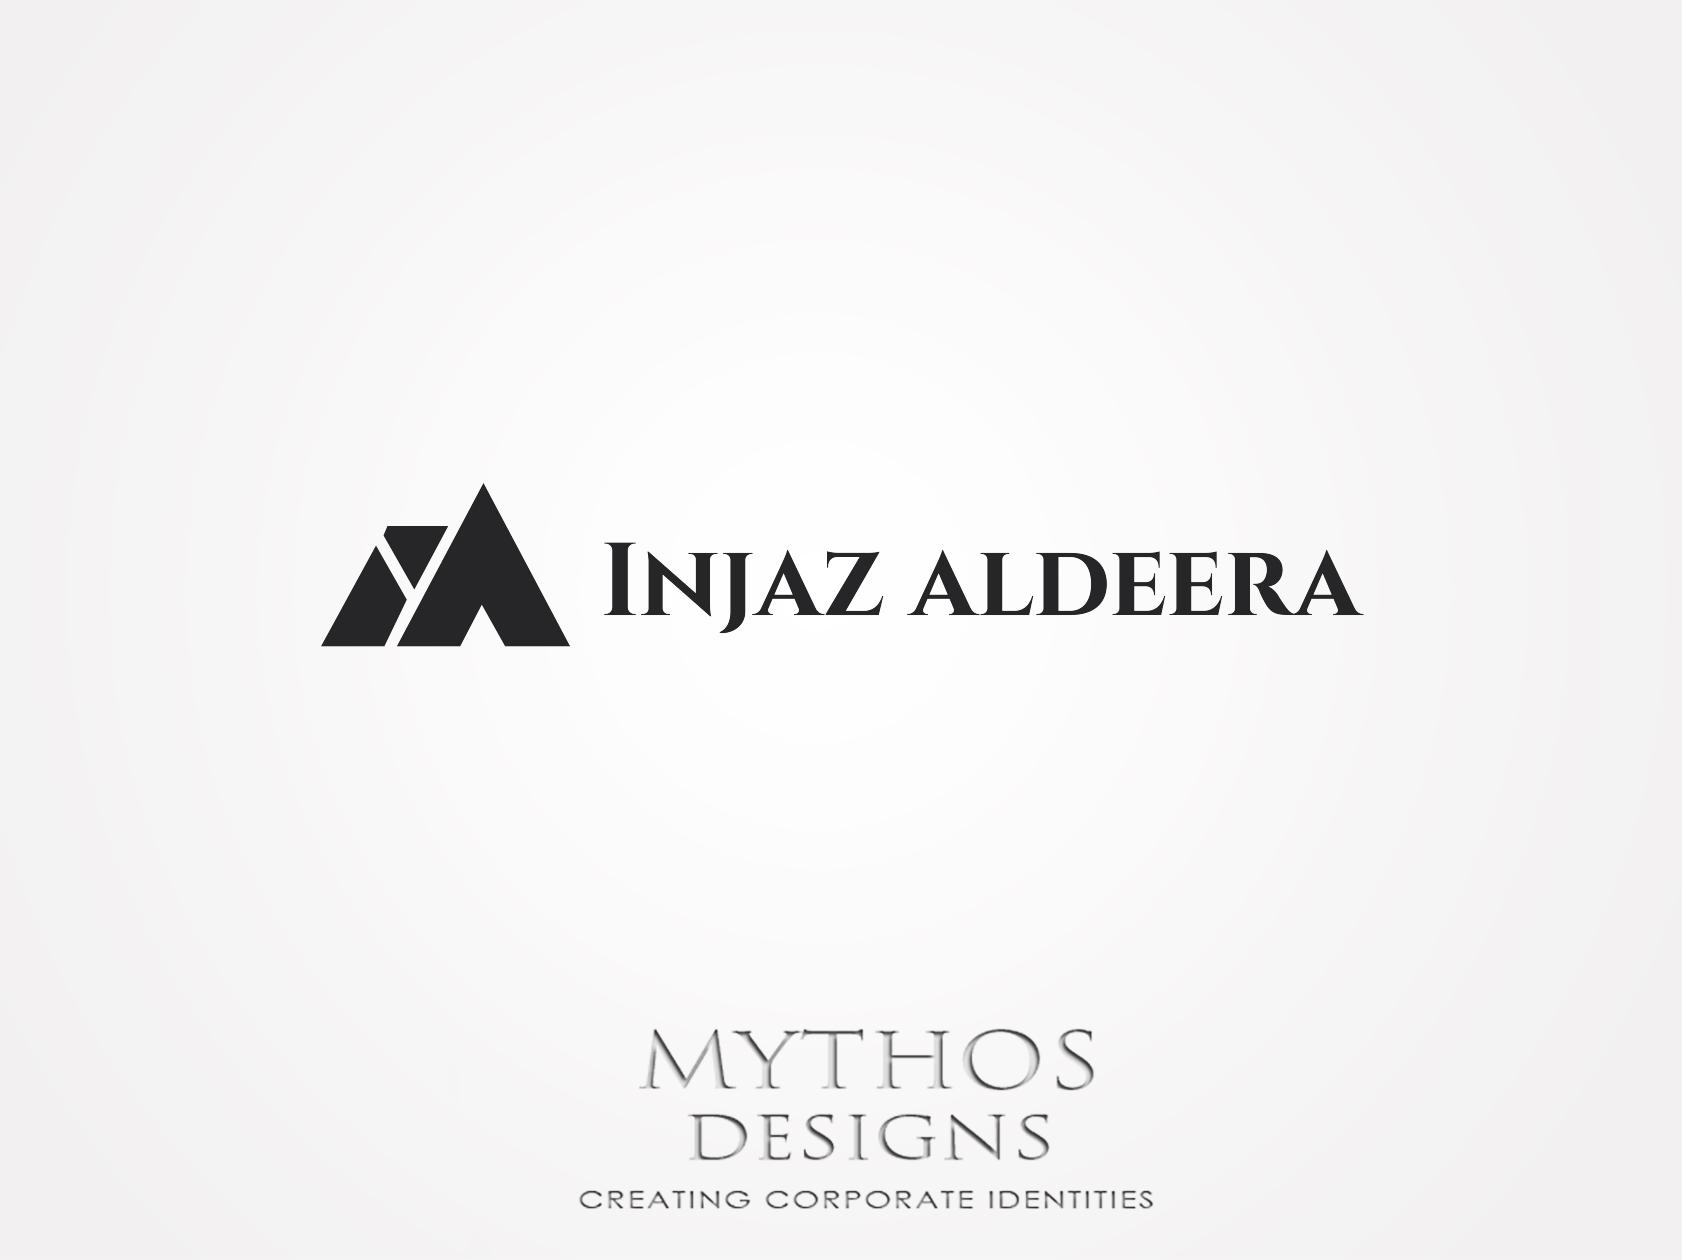 Logo Design by Mythos Designs - Entry No. 32 in the Logo Design Contest Fun Logo Design for Injaz aldeera.